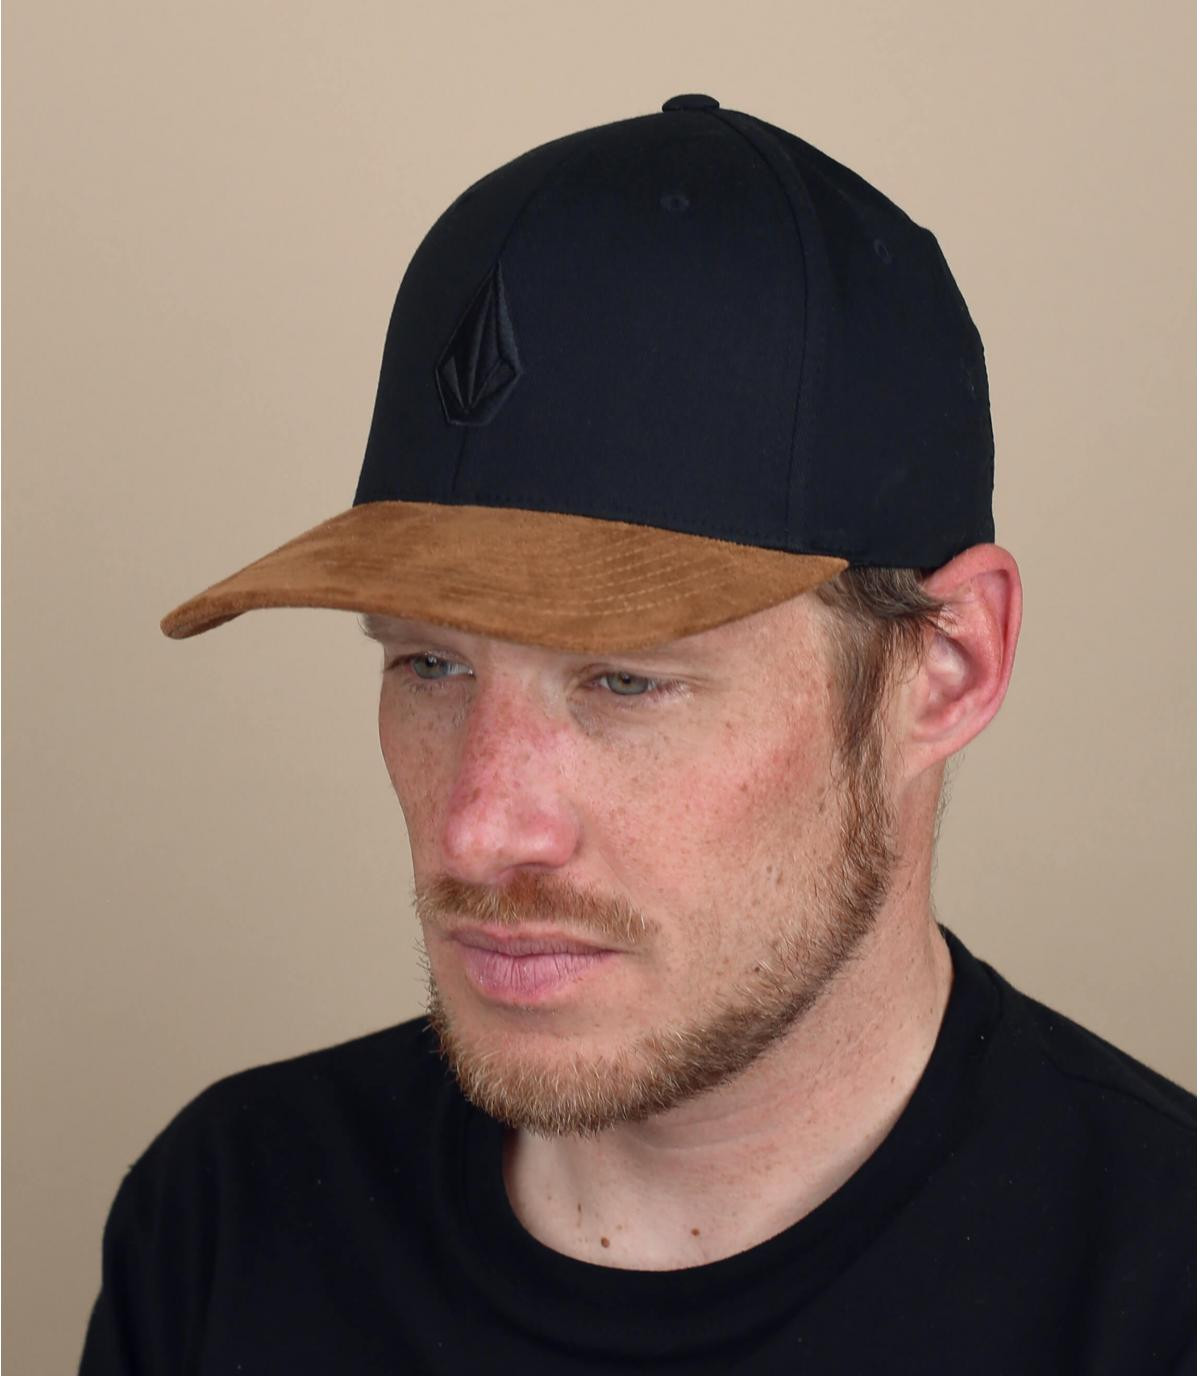 Volcom cappellino nero visiera scamosciata